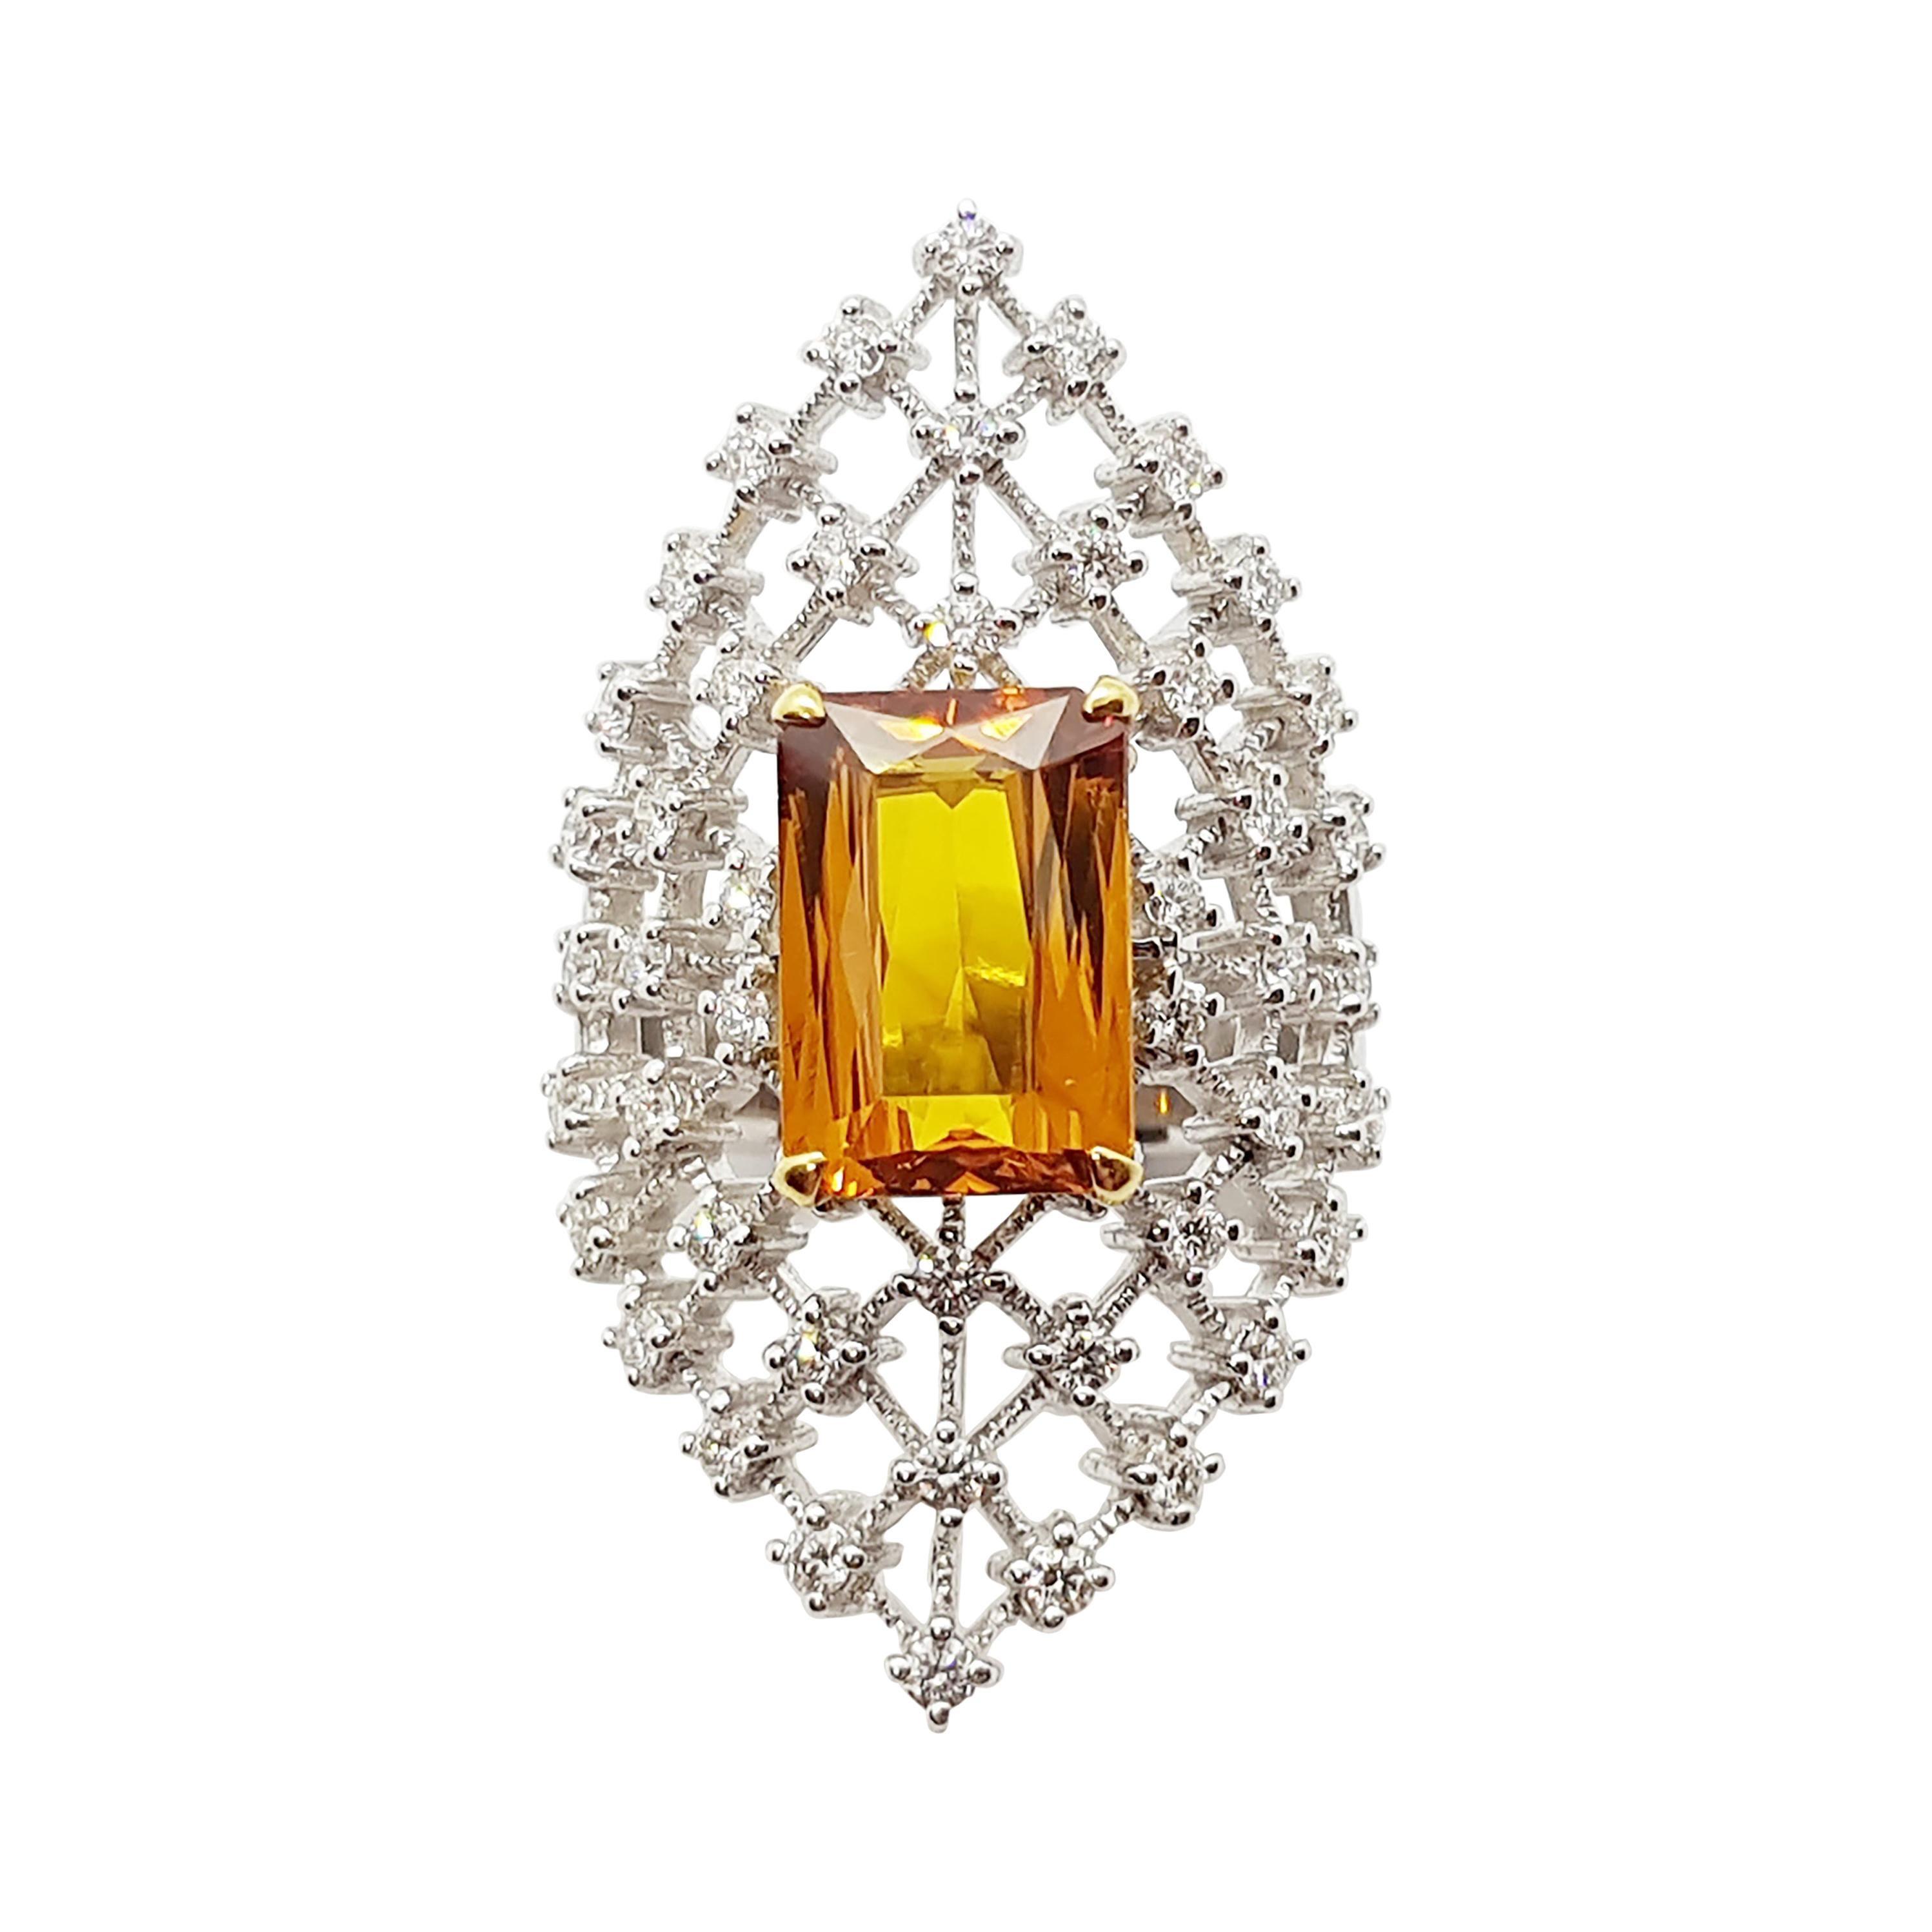 Yellow Sapphire with Diamond Ring Set in 18 Karat White Gold Settings